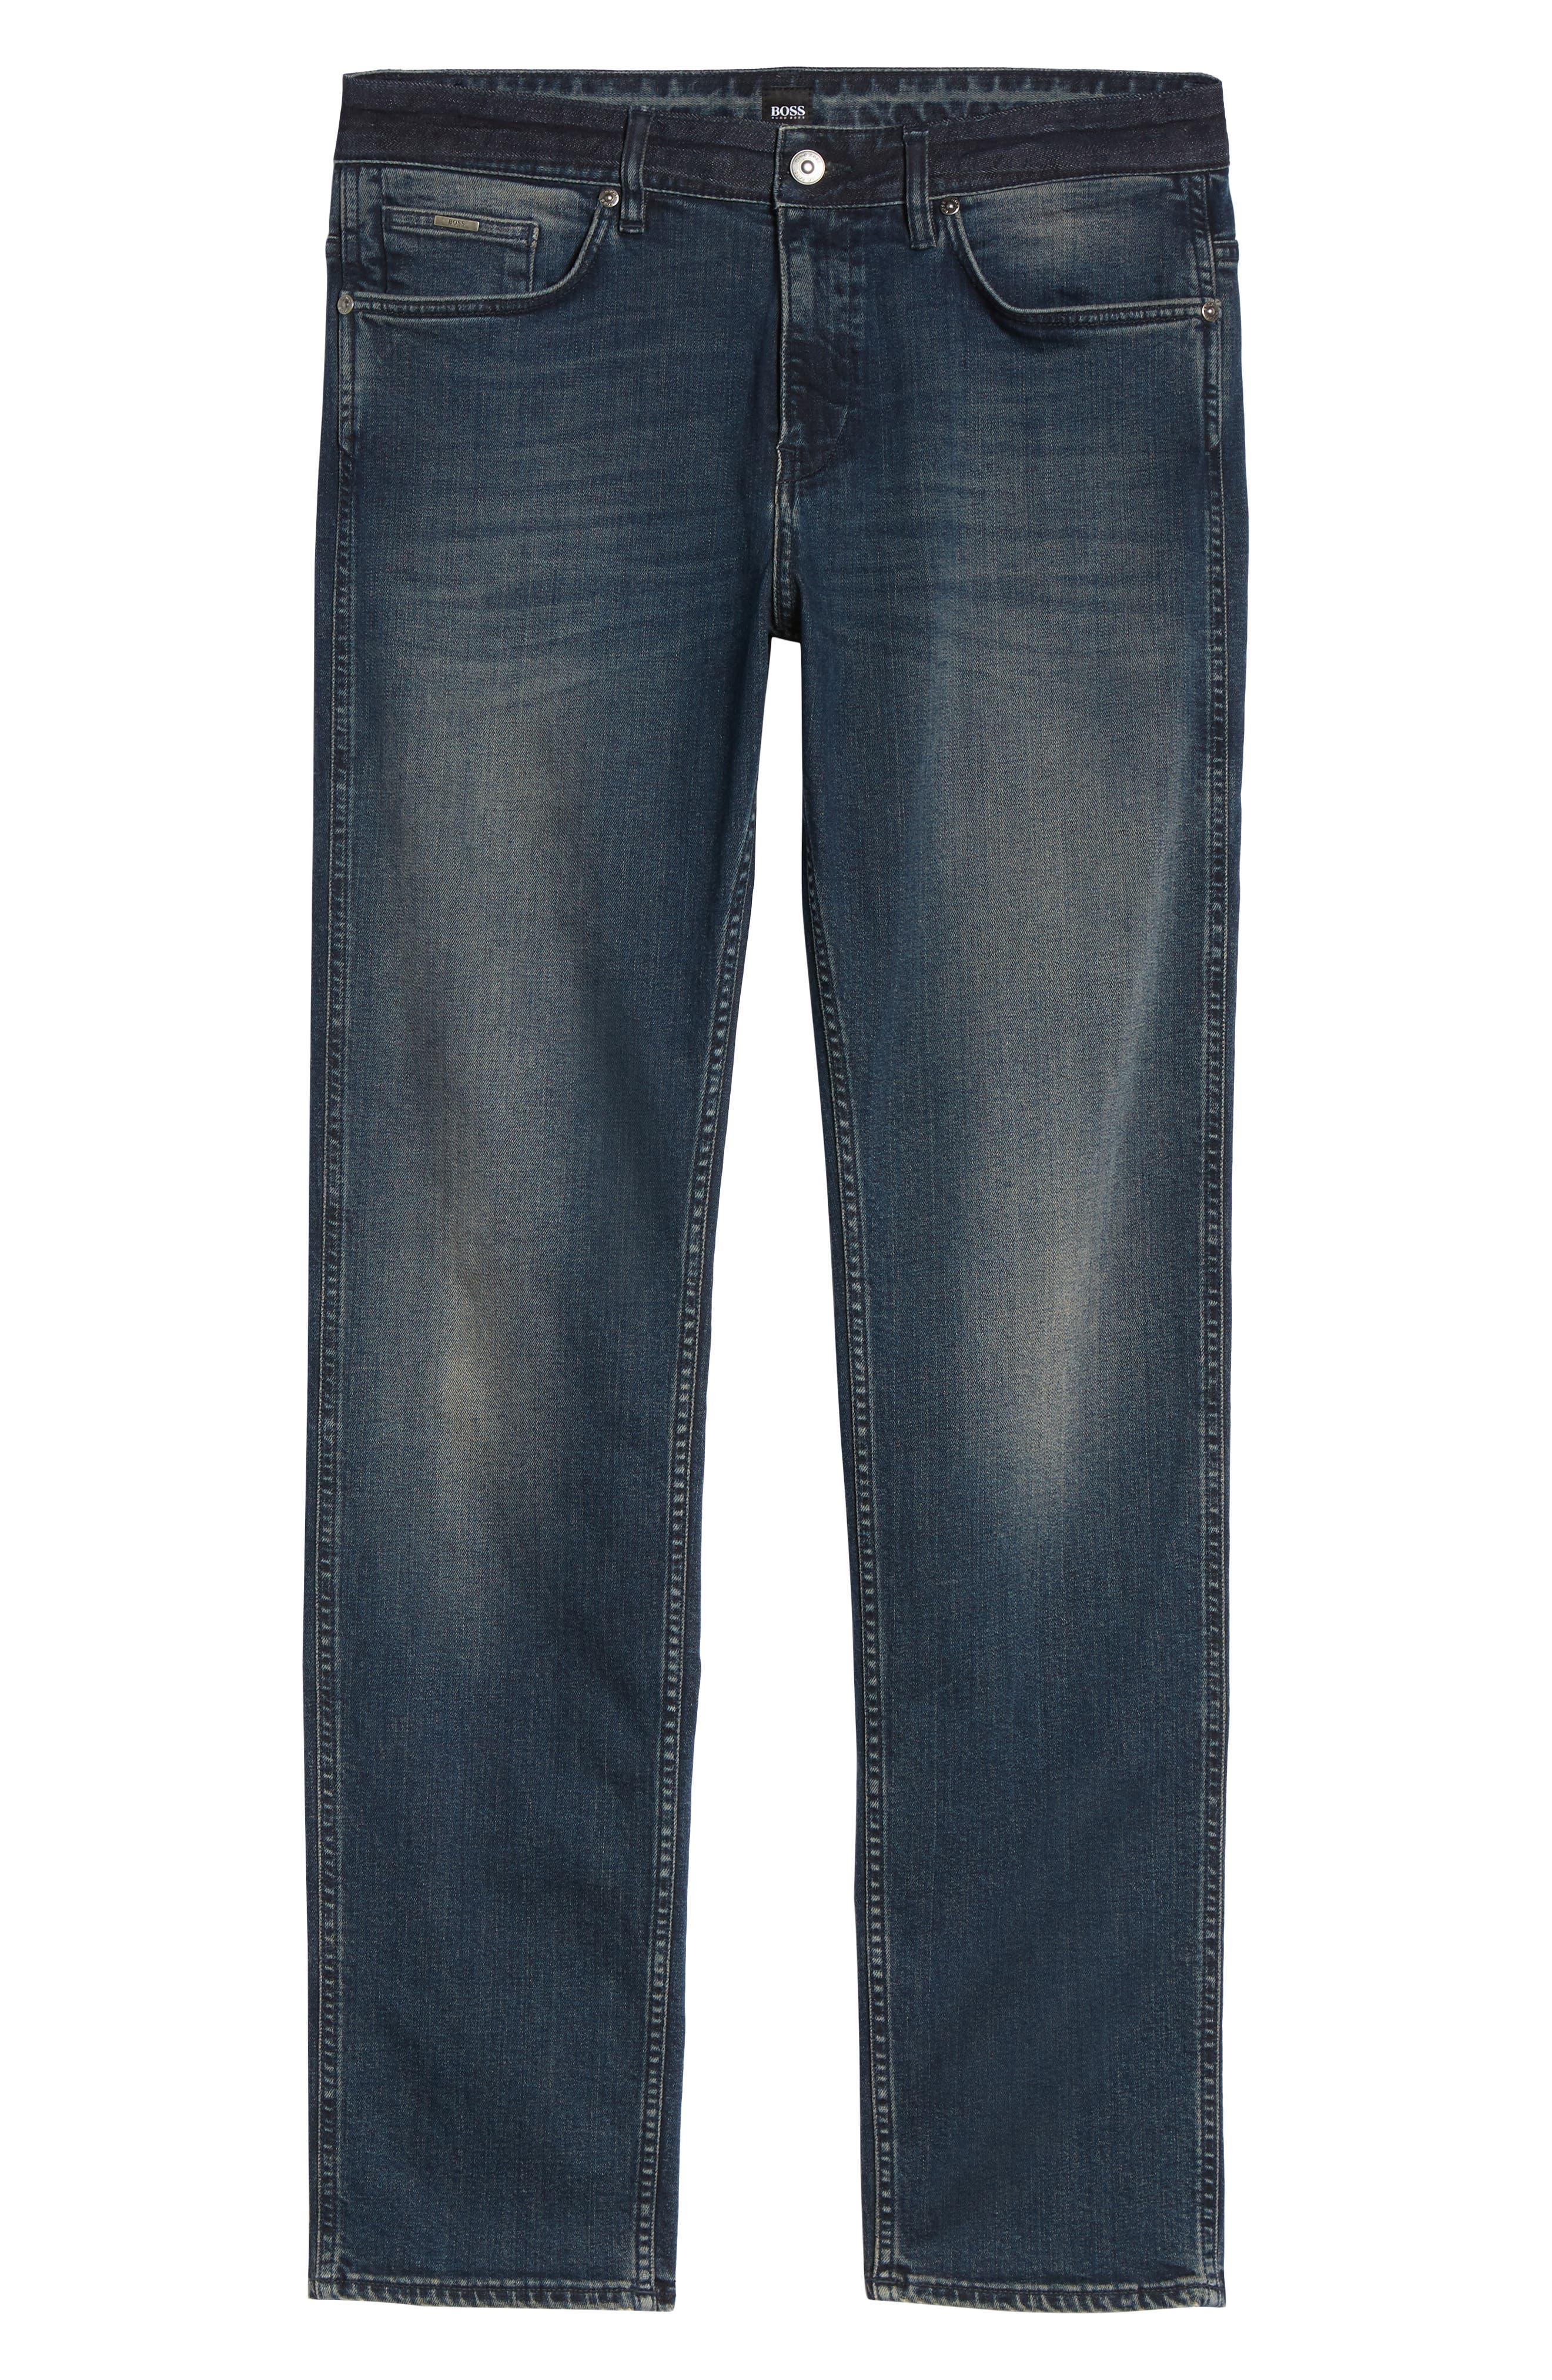 Delaware Slim Fit Jeans,                             Alternate thumbnail 6, color,                             418